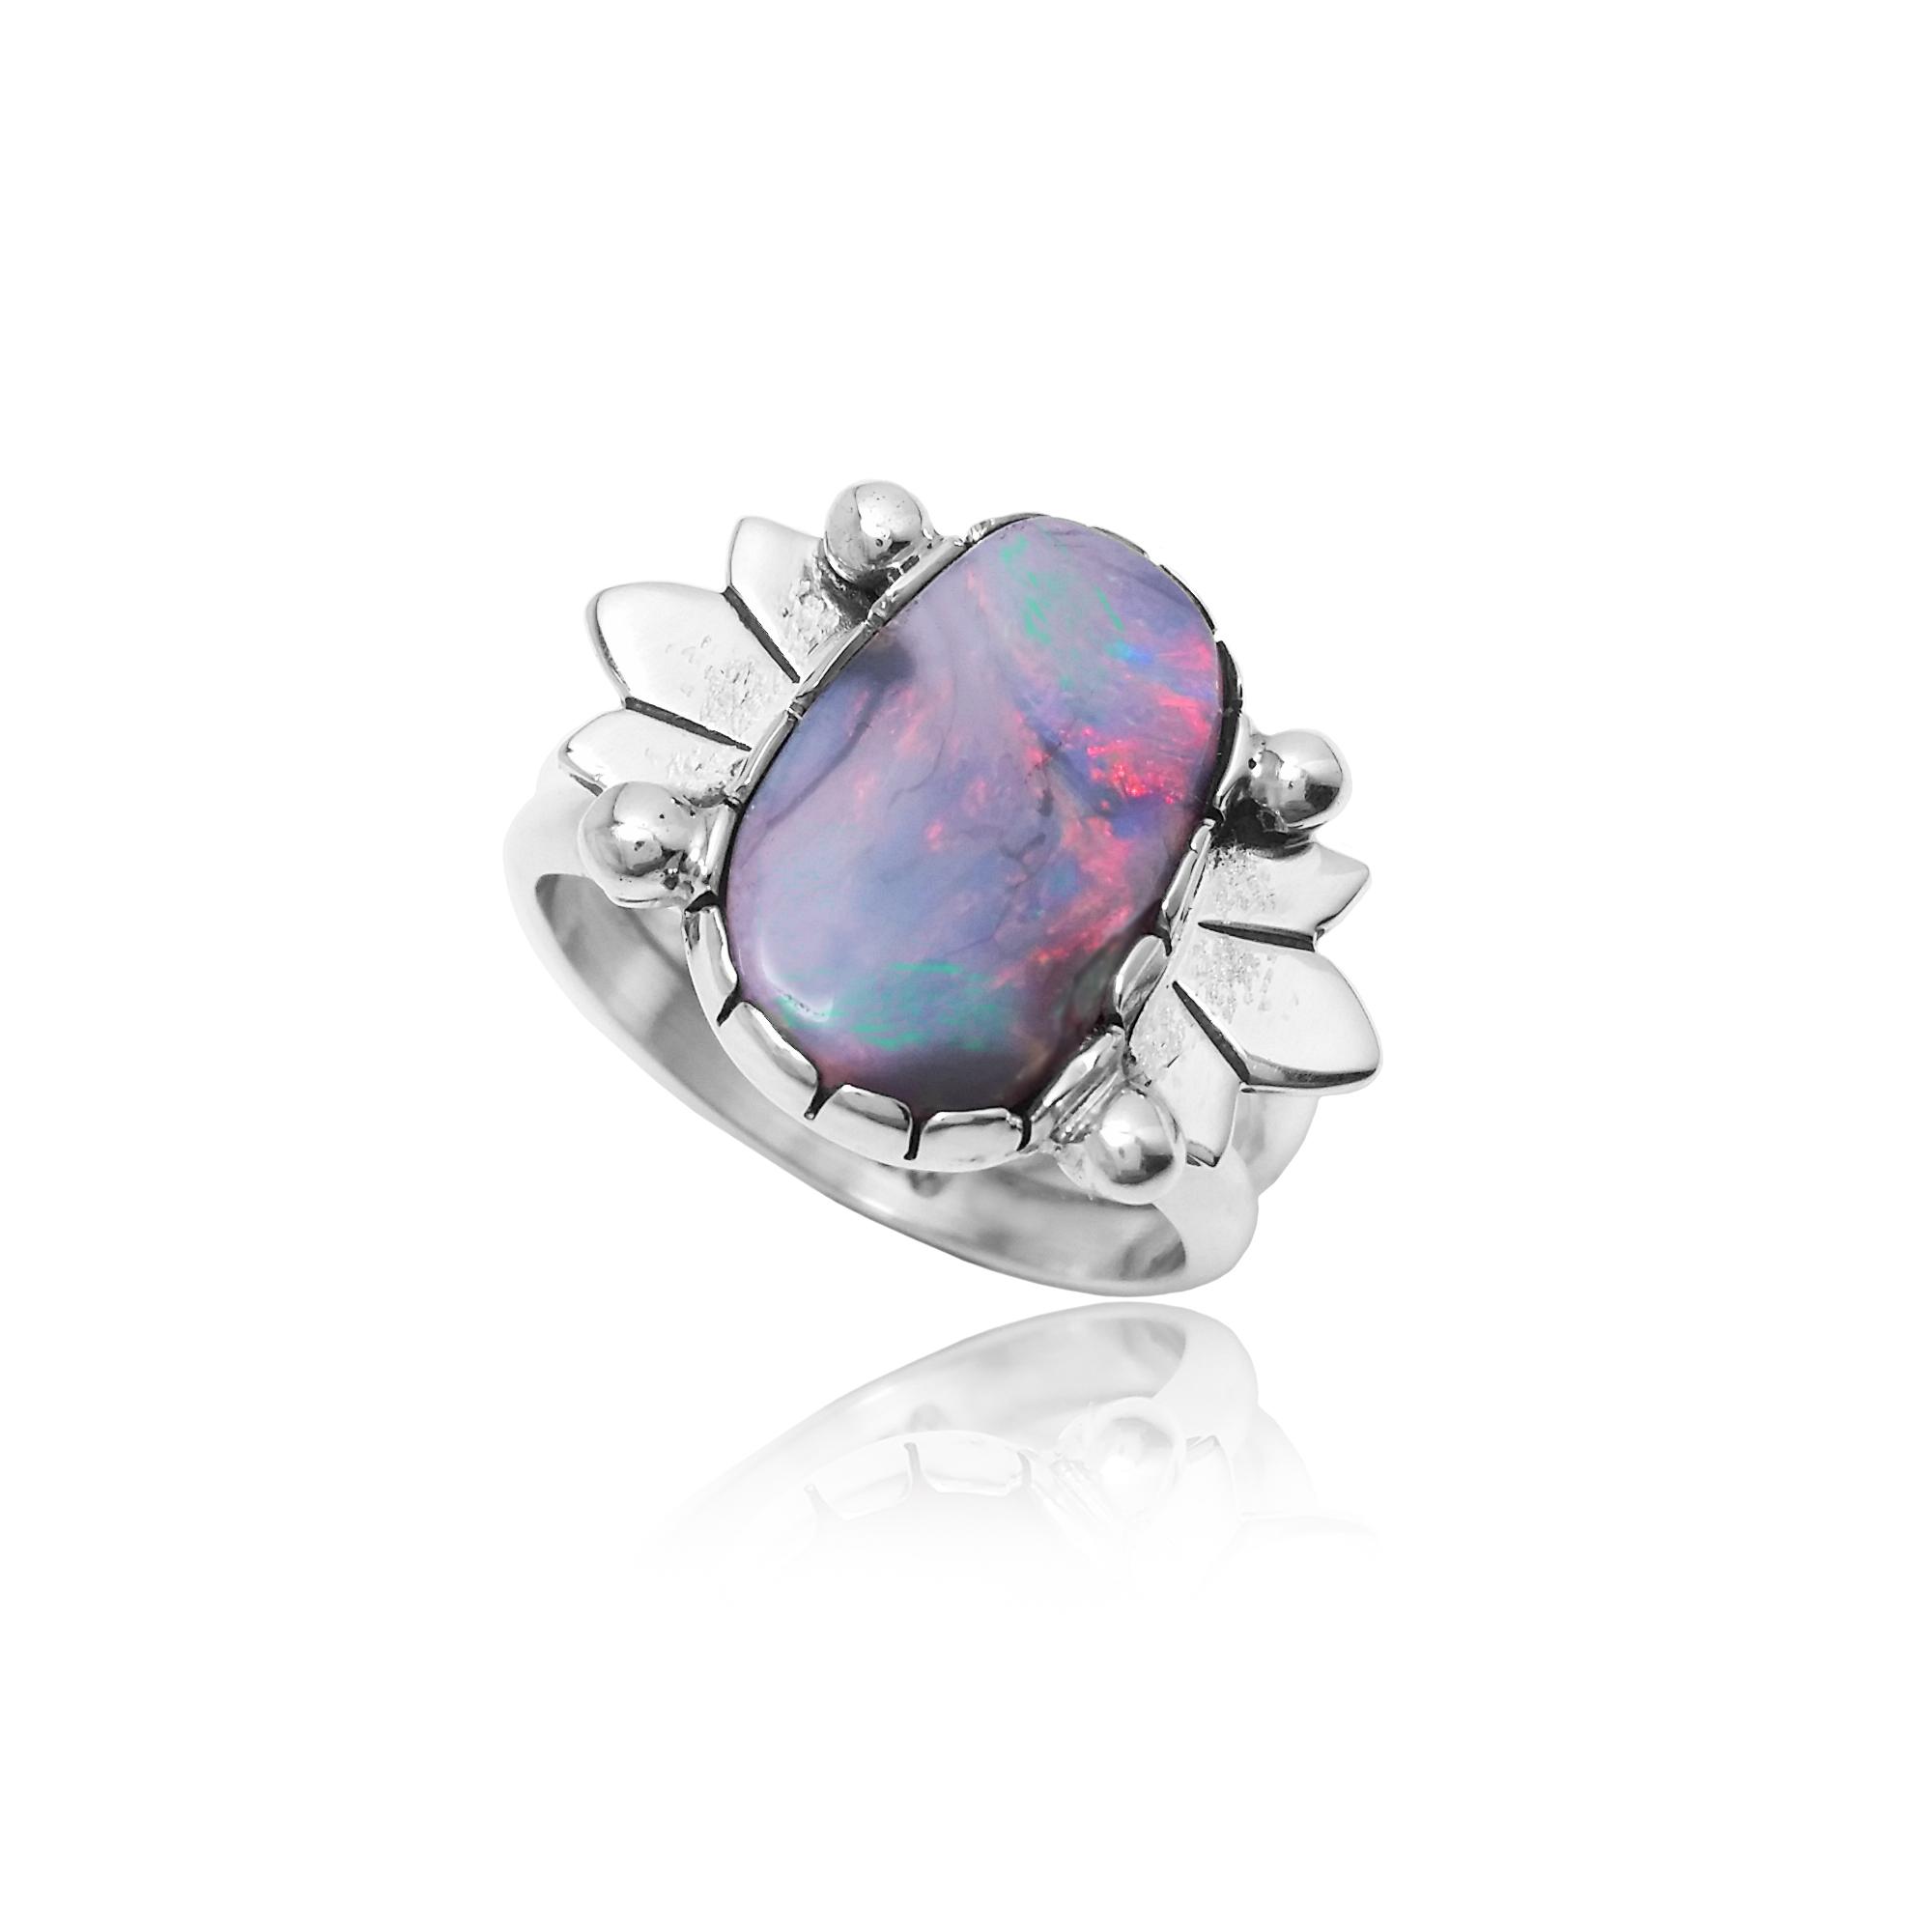 "Jason Brown, ""Australian Opal Ring"", 2015.    White Australian Opal and Sterling Silver.Photo Courtesy of Artist."